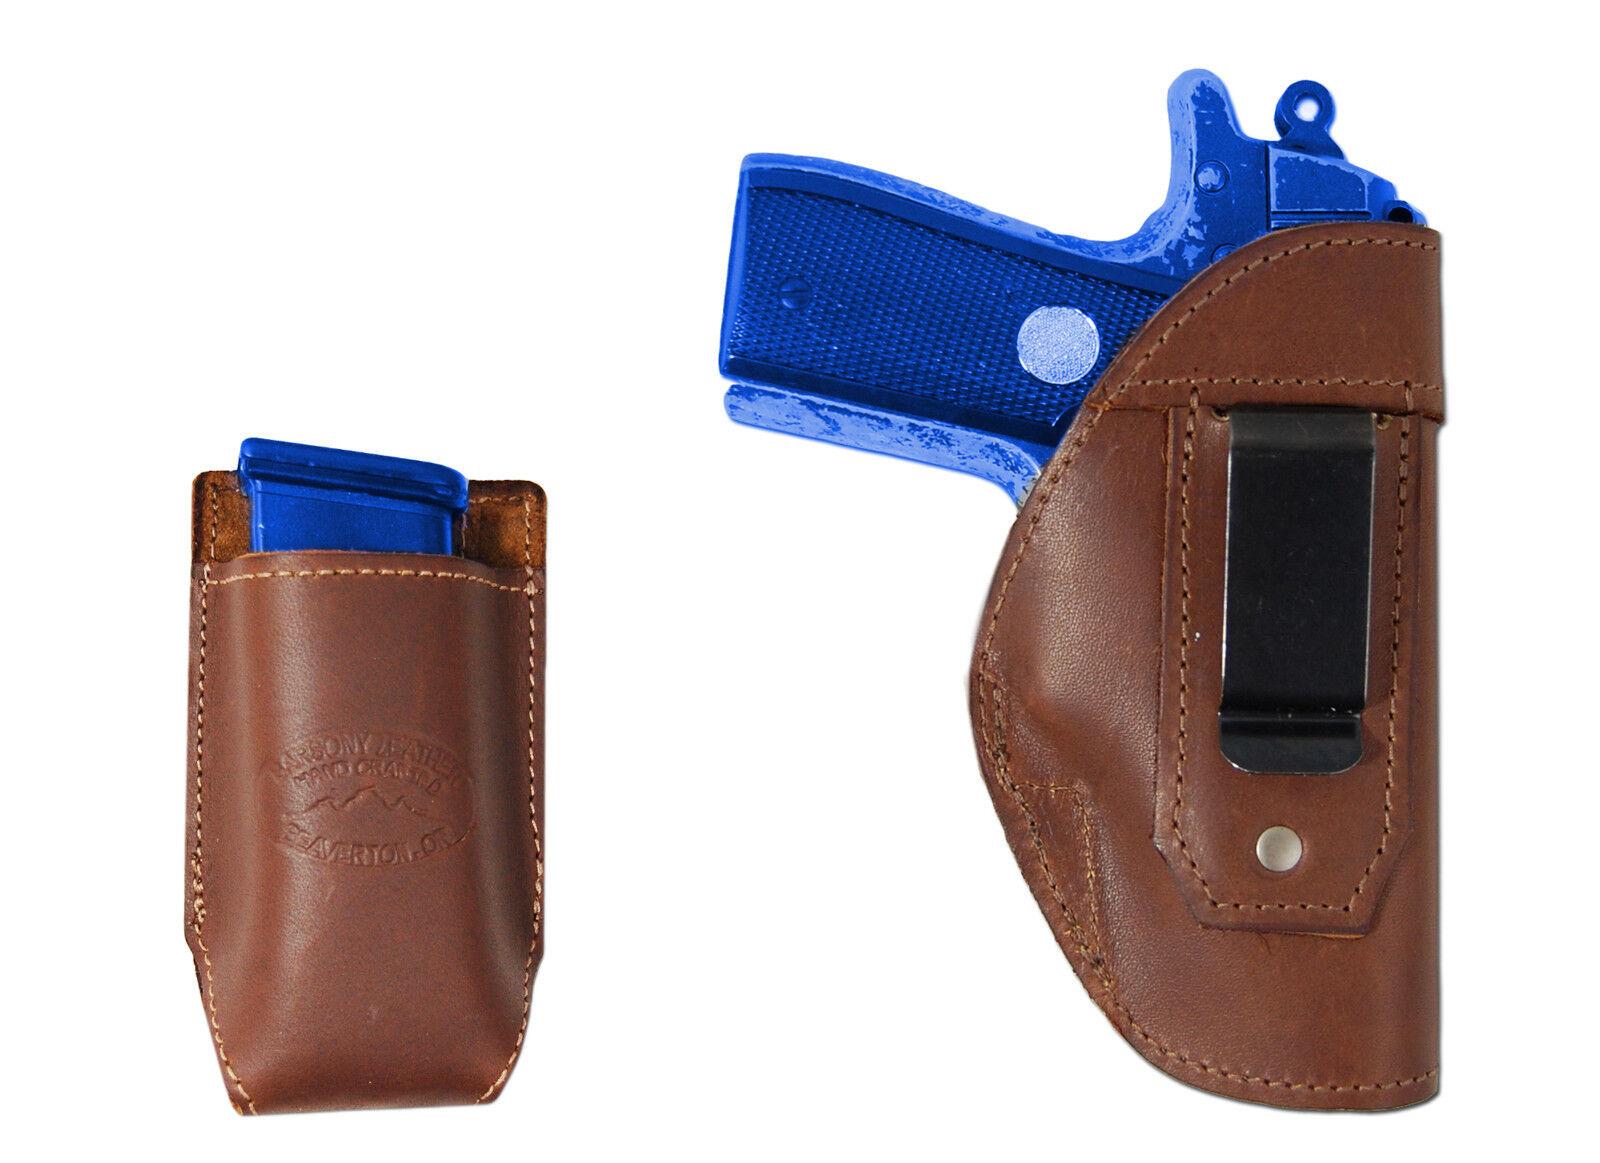 New Barsony Braun Leder IWB Holster + Mag Pouch Colt Ultra 380 Ultra Colt Compact 9mm 40 b1e7aa